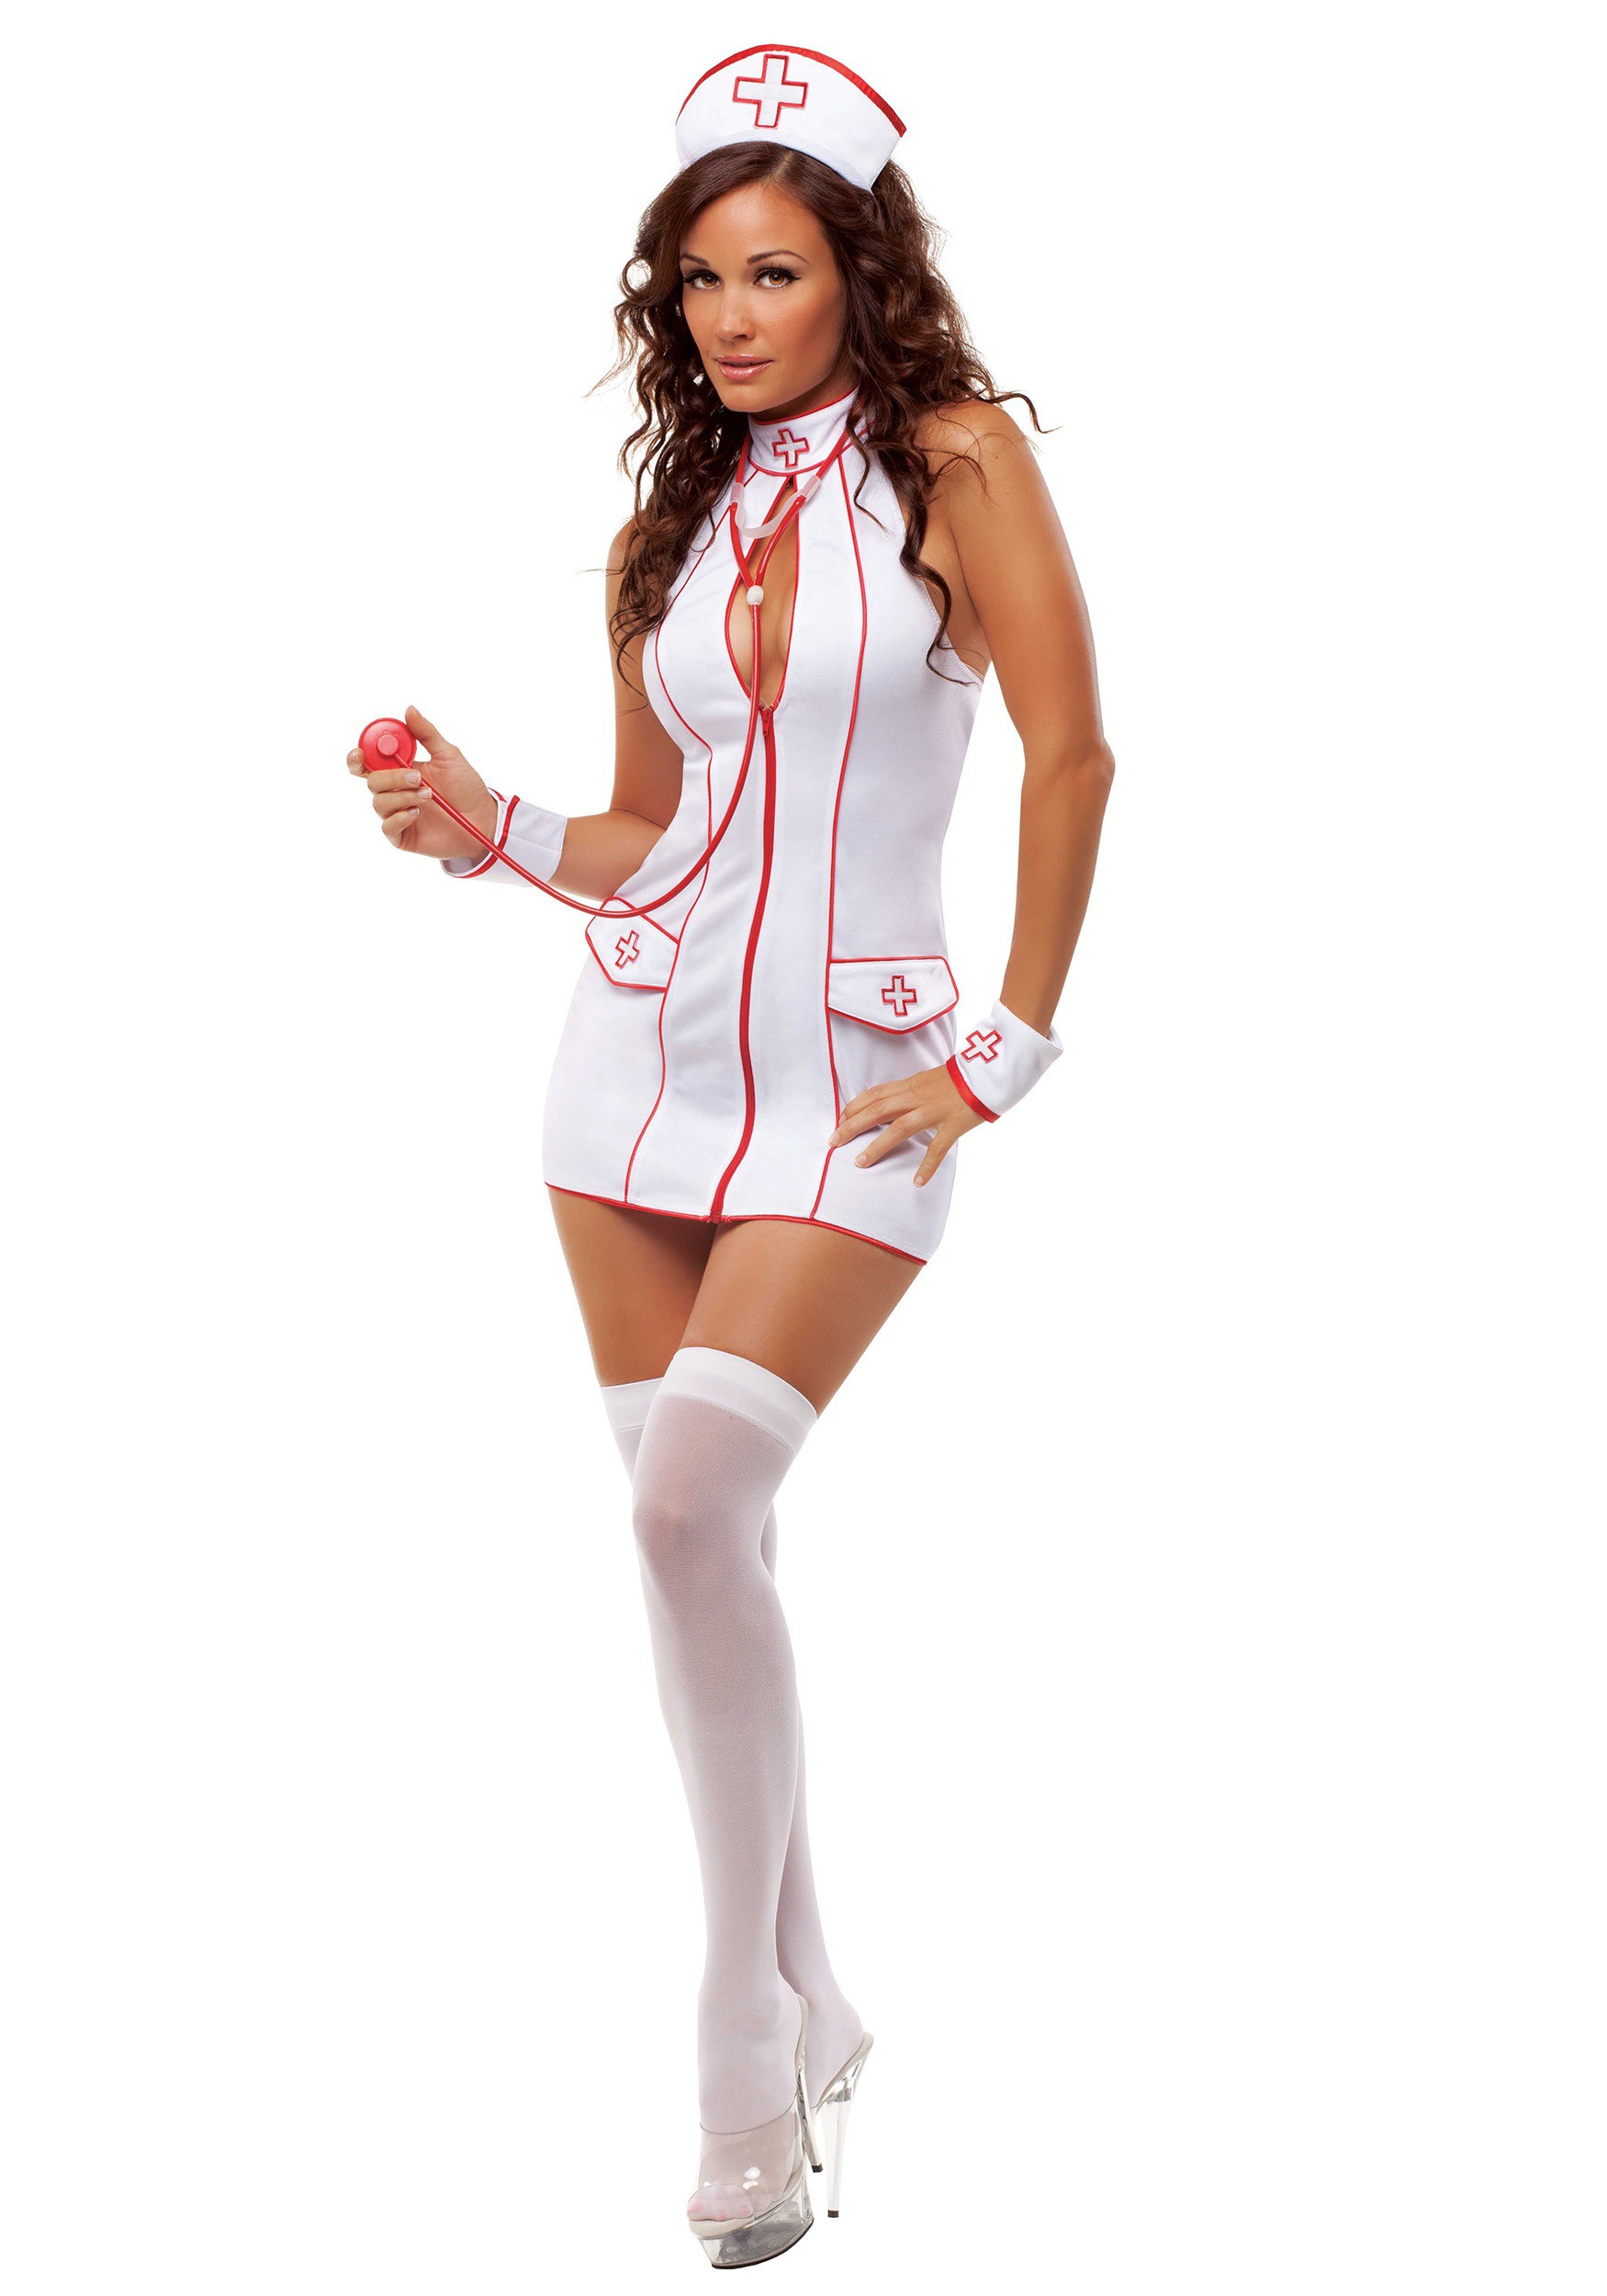 PVC Sexy Nurse Costume Set - Just $7